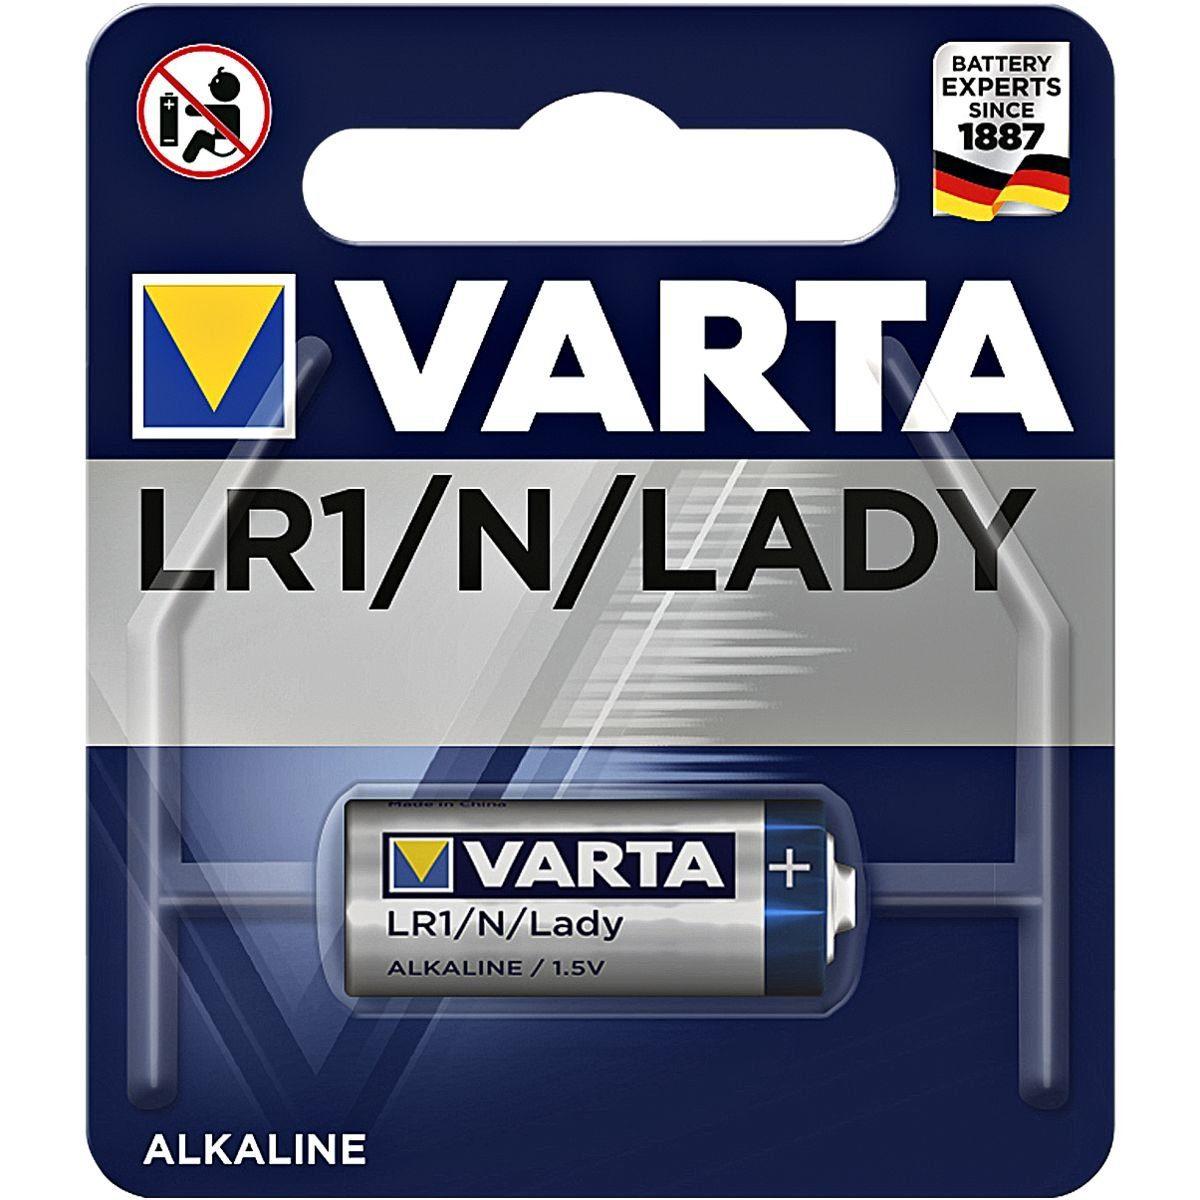 Varta Batterie »Professional Electronics« Lady / LR1